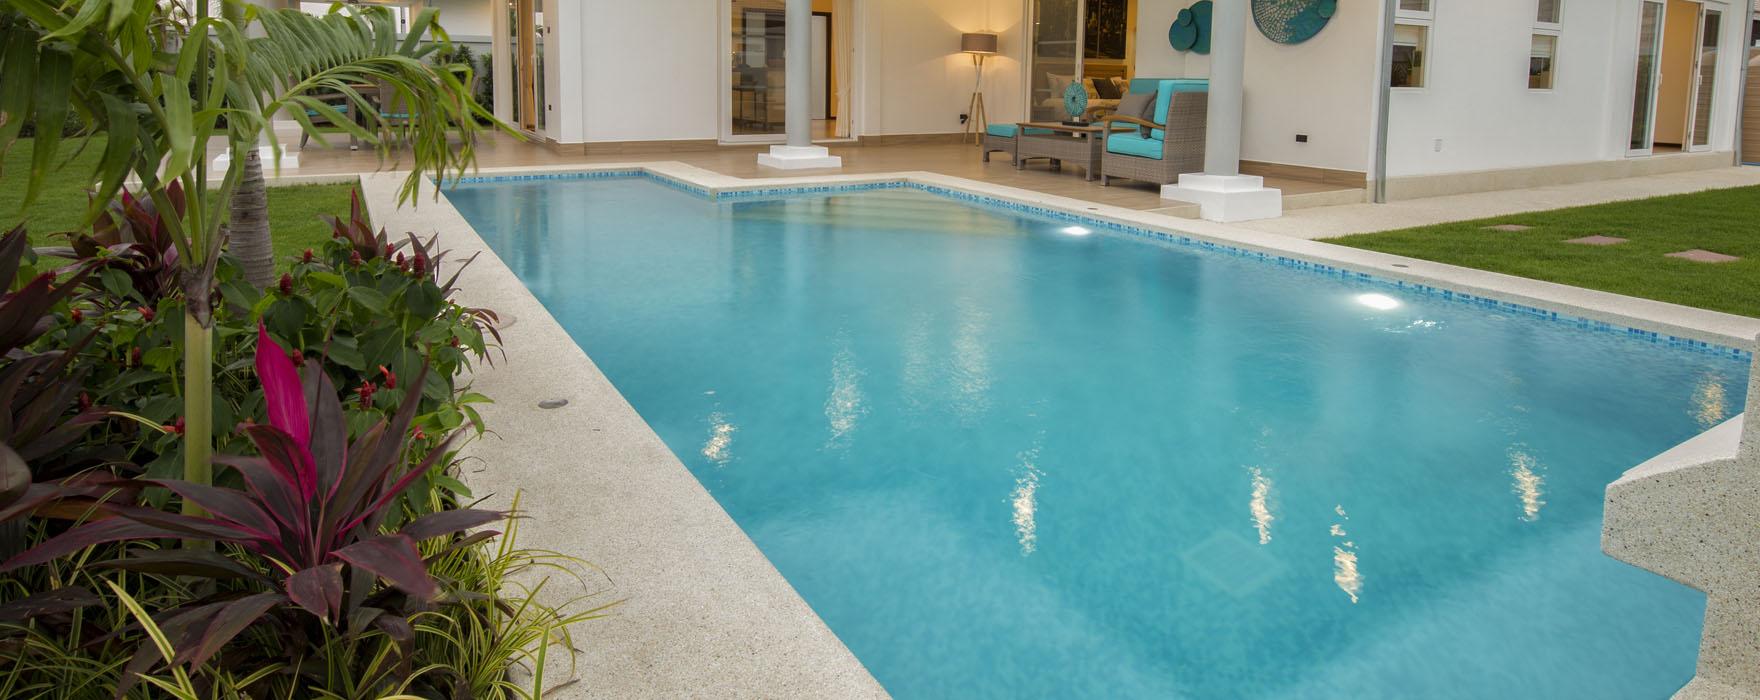 Swimming Pools in Hua Hin   Pools R Uz